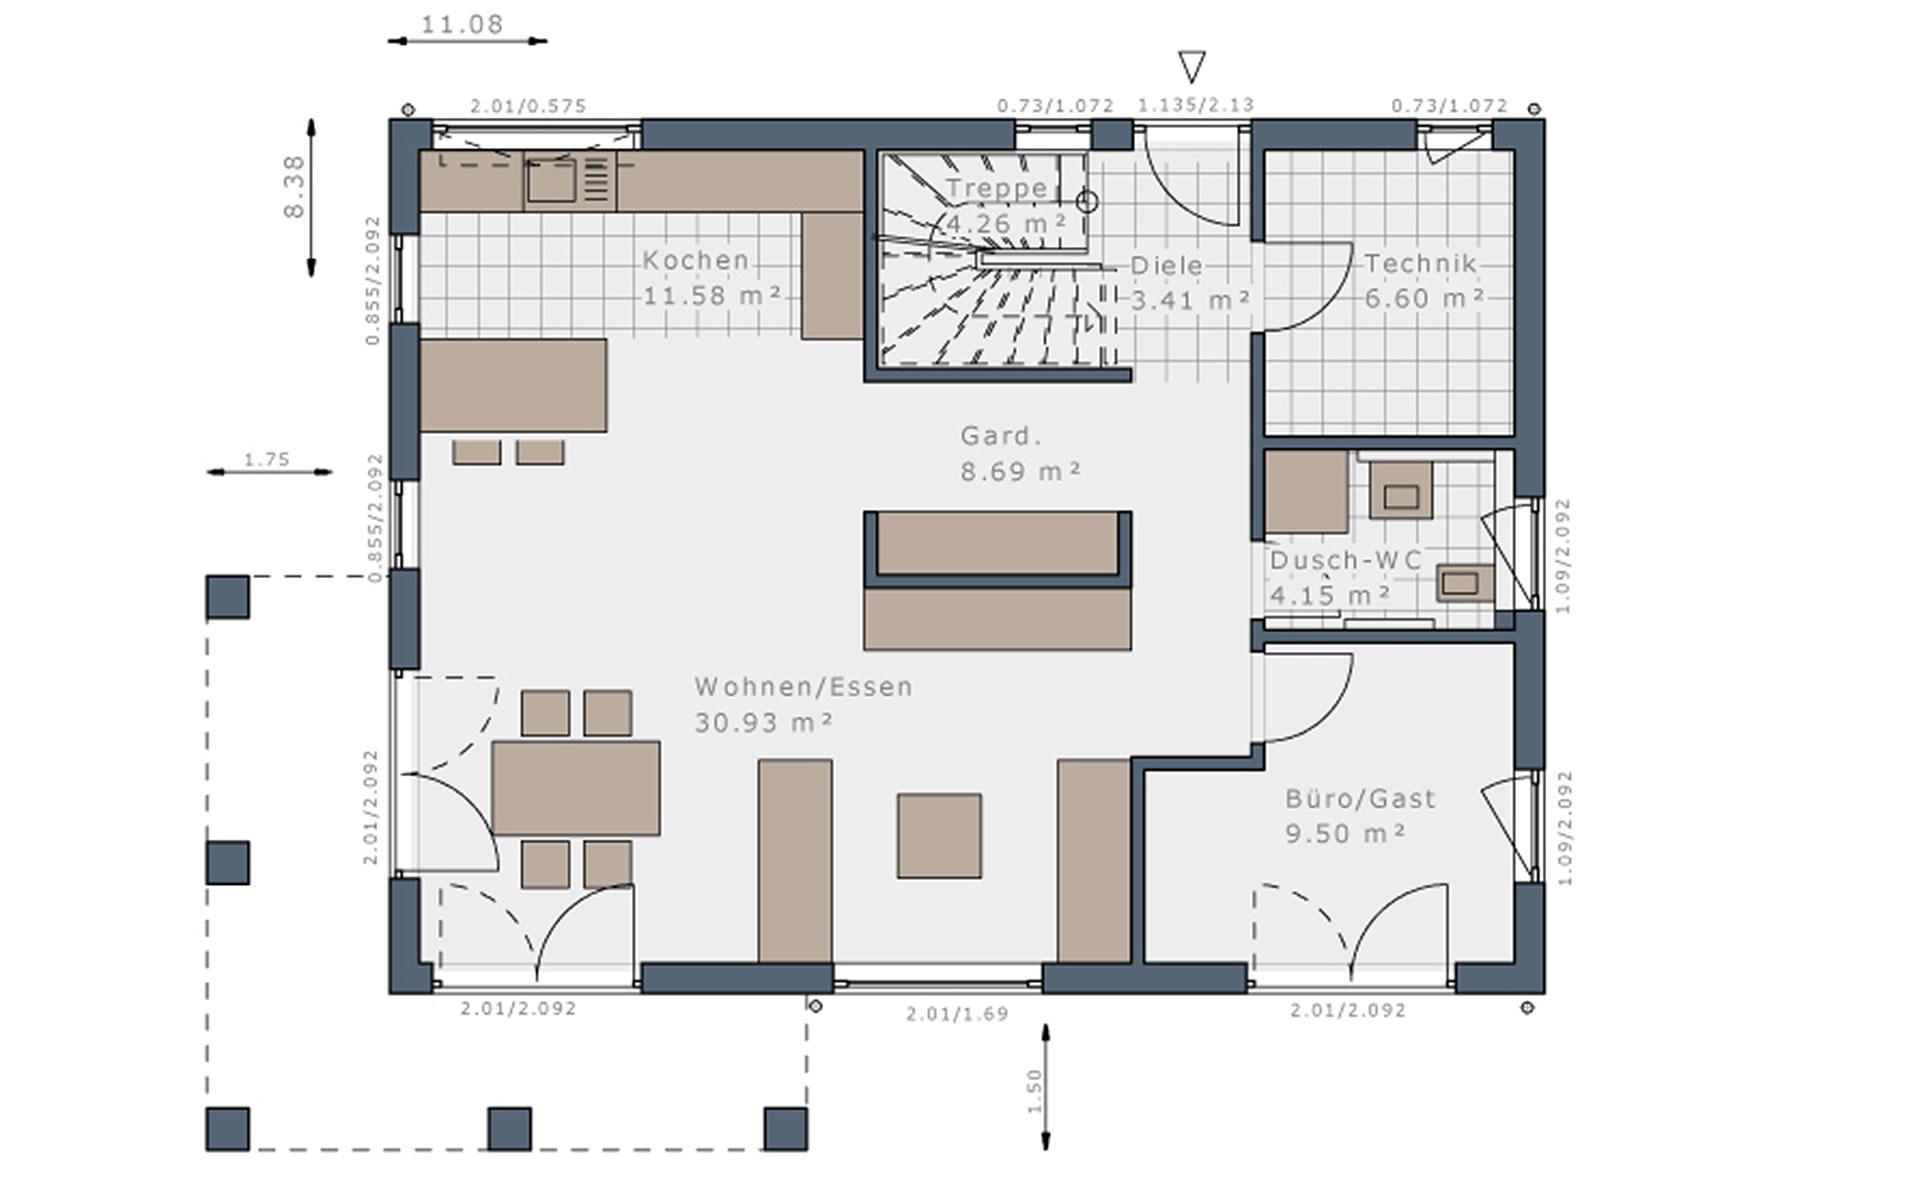 Erdgeschoss Solitaire-E-155 E7 von Schwabenhaus GmbH & Co. KG